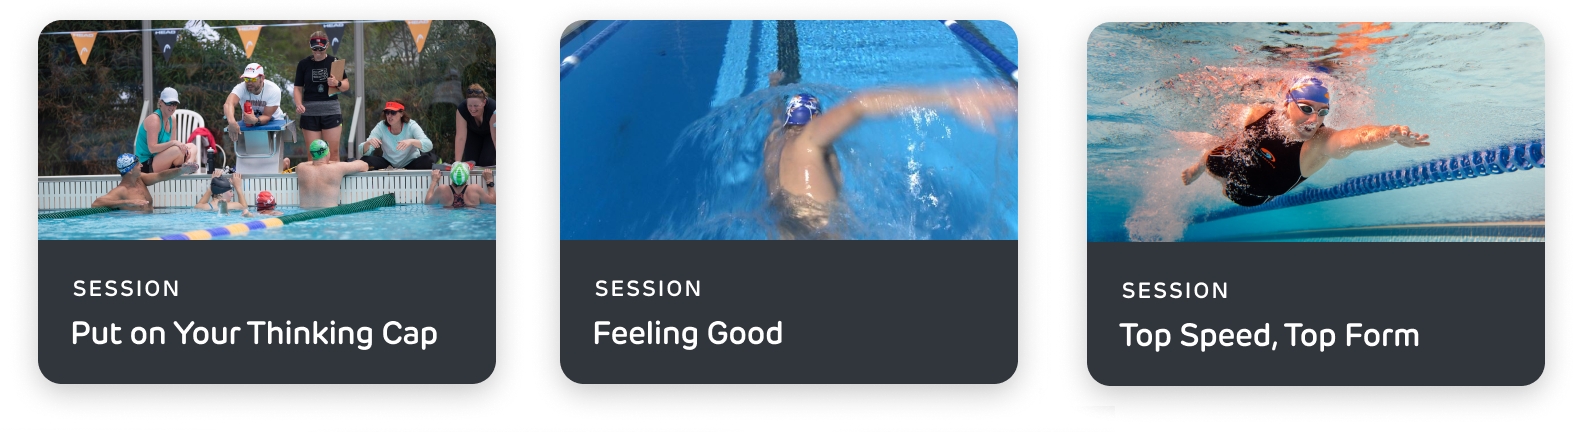 Swim-Smooth